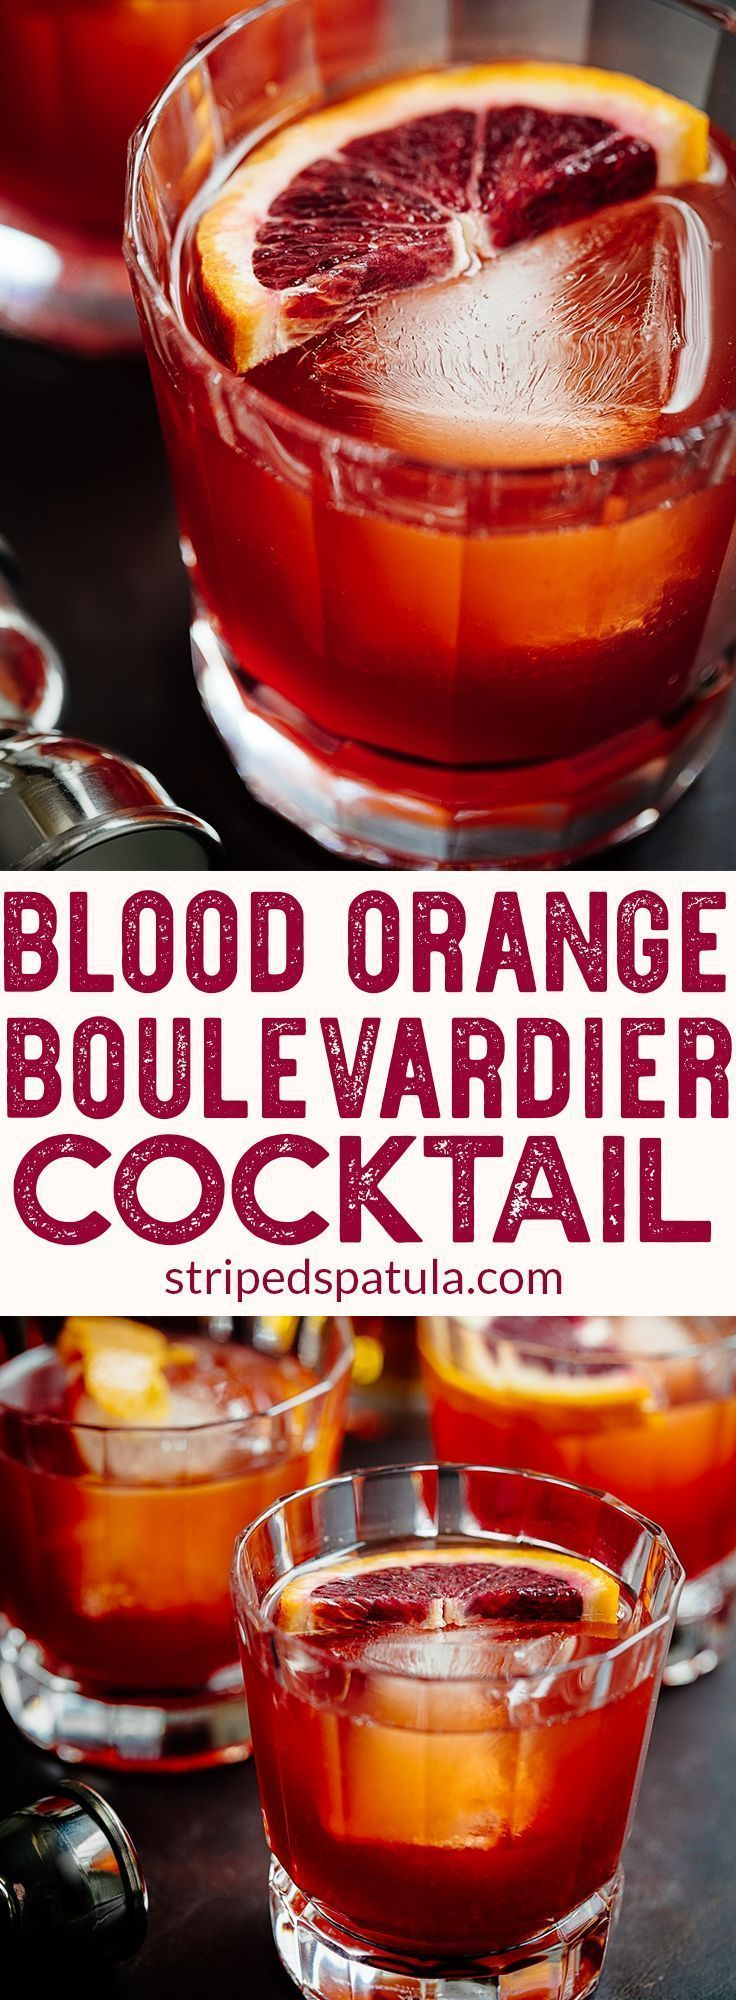 Blood Orange Boulevardier Cocktail | Campari Drinks | Campari Cocktail | Bourbon Cocktails | Bourbon Drinks | Whiskey Cocktails | Cocktail Recipes | Alcoholic Drinks | #drinkrecipes #alcohol #cocktails #cocktailrecipe #bourbon #stripedspatula #cocktailrecipes